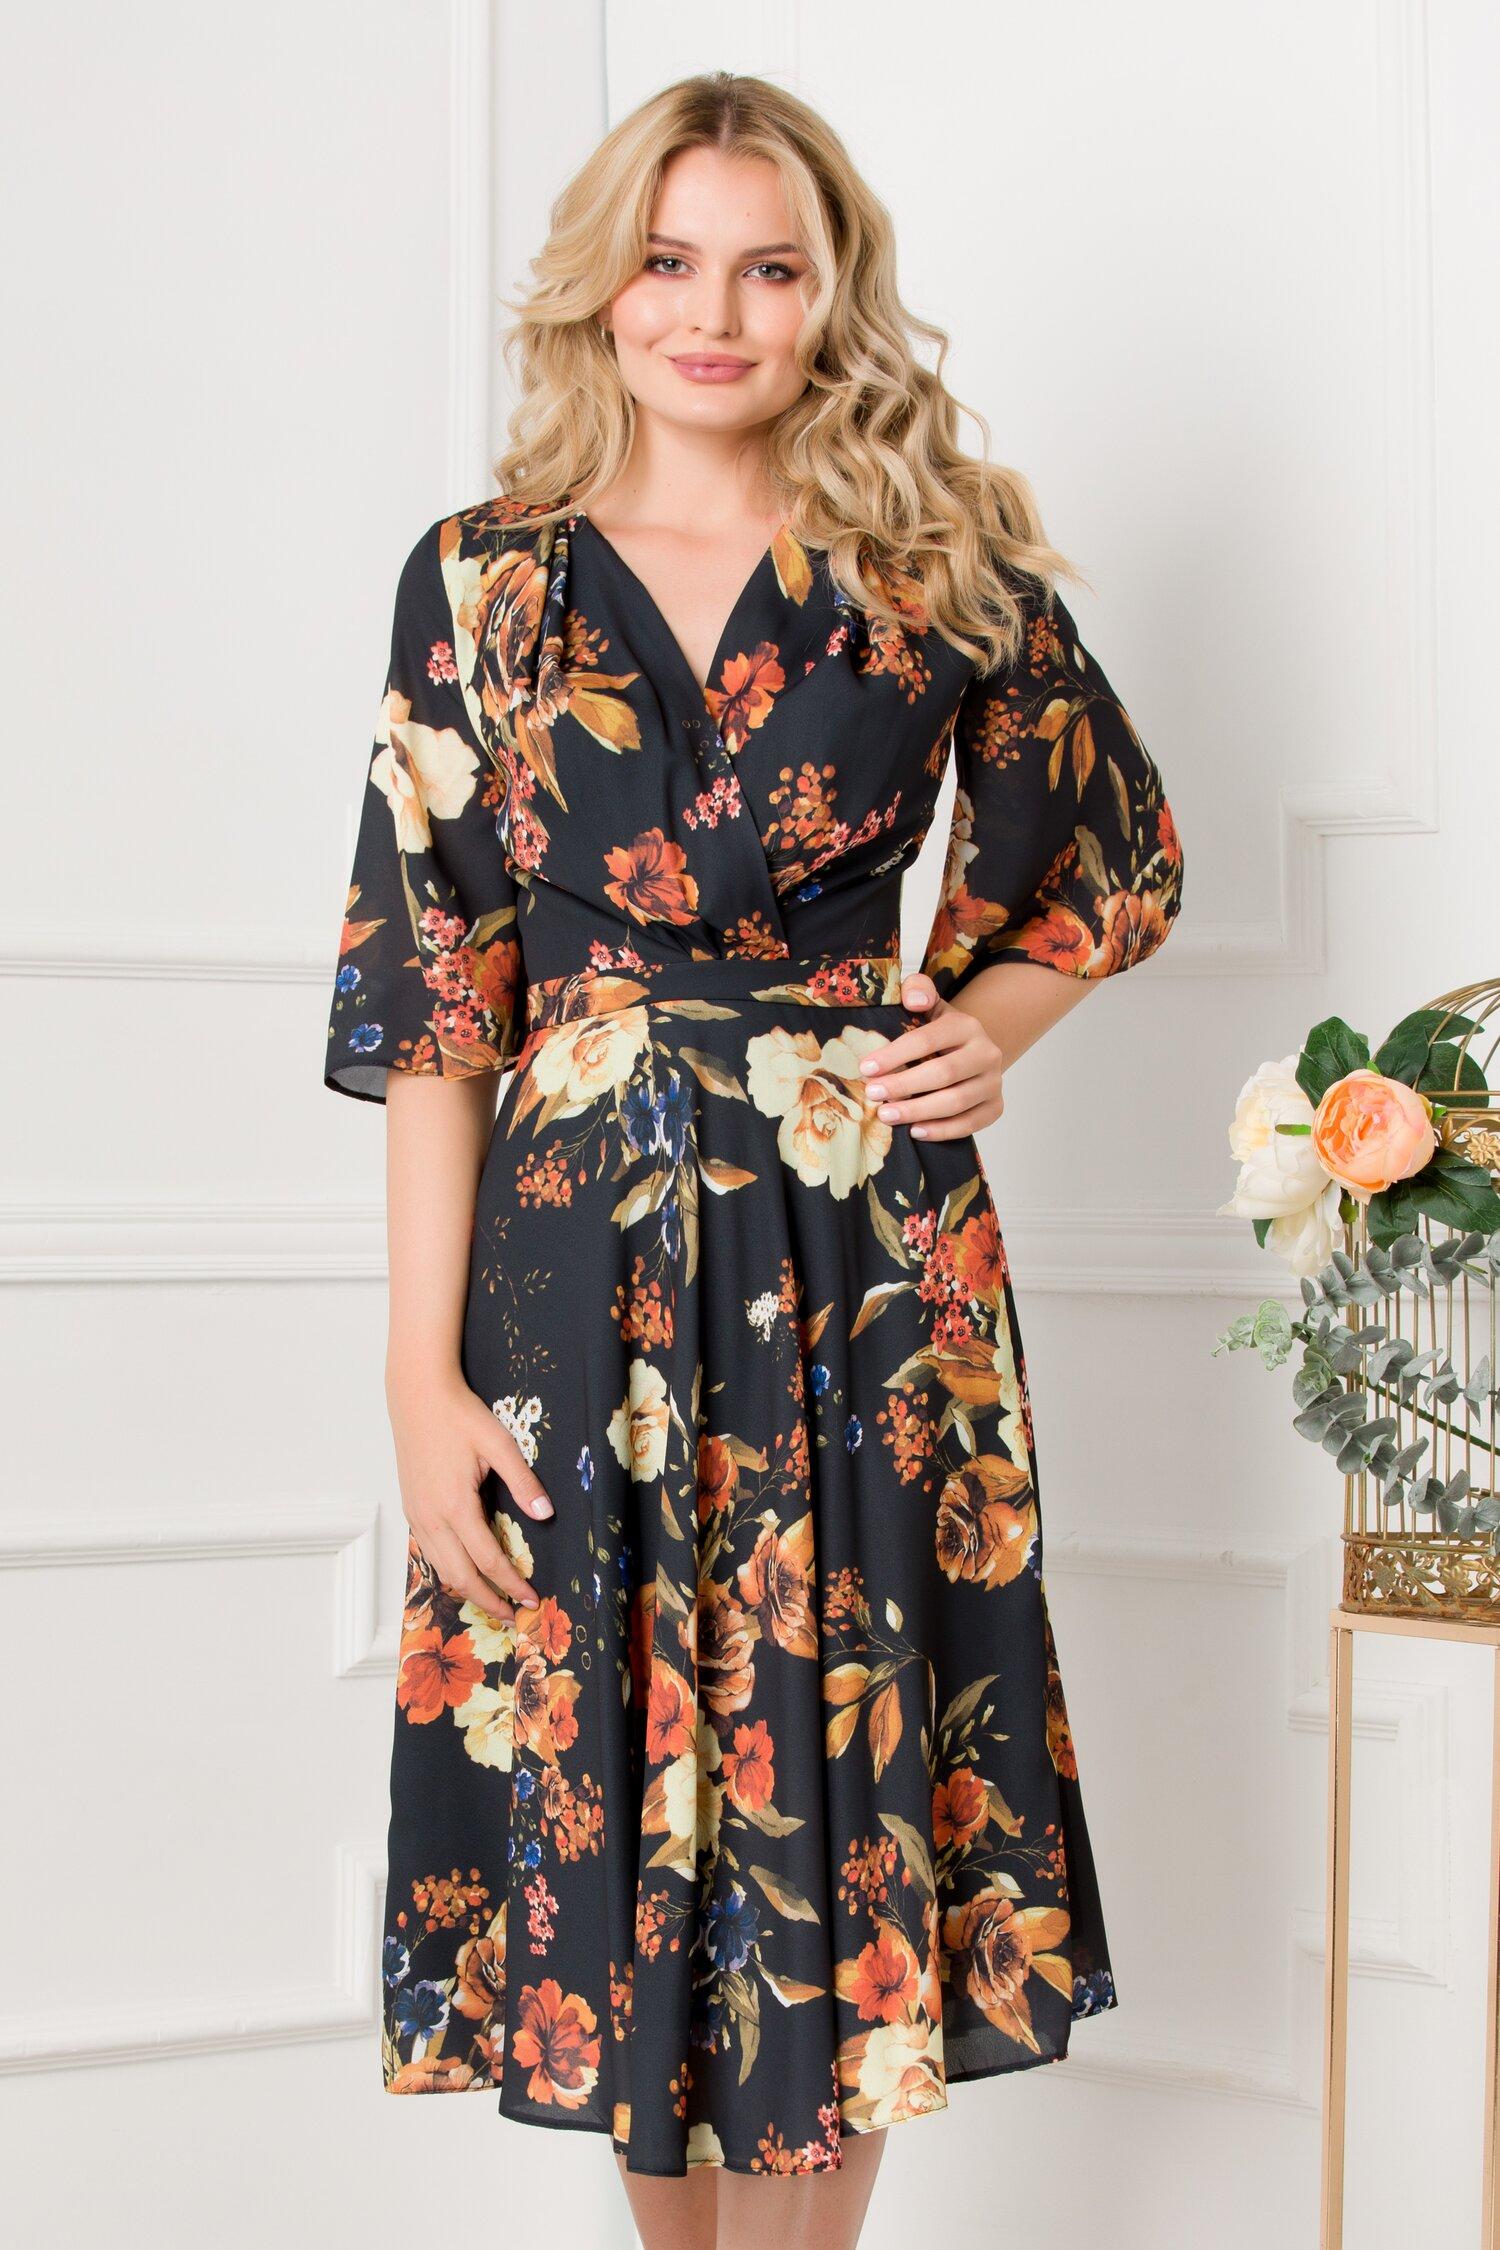 Rochie LaDonna neagra cu imprimeu floral orange